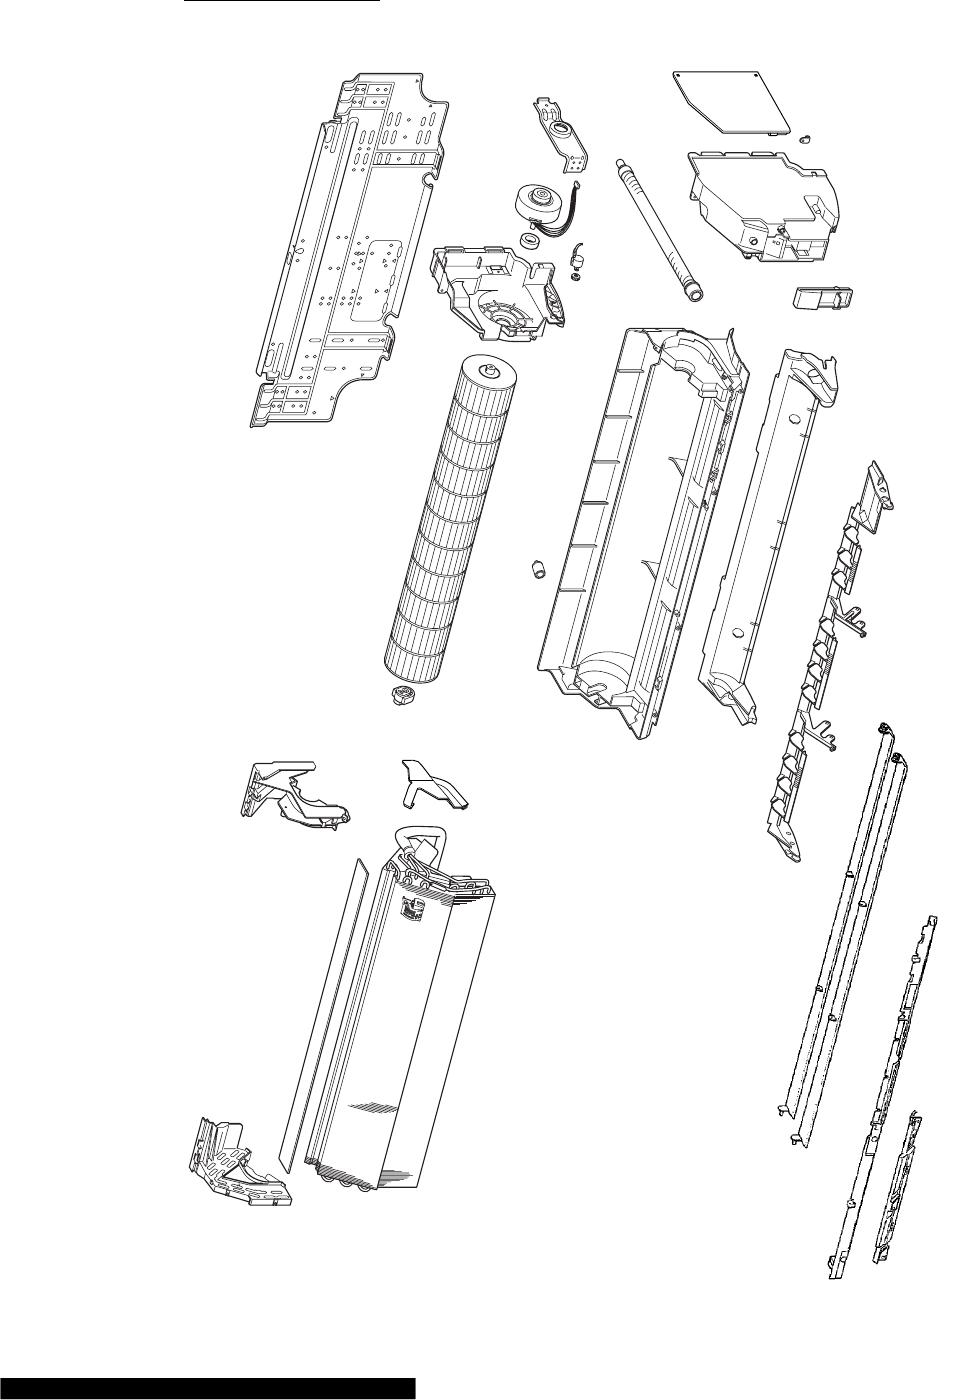 Fujitsu Halcyon Asu9Rlq Service Manual ManualsLib Makes It